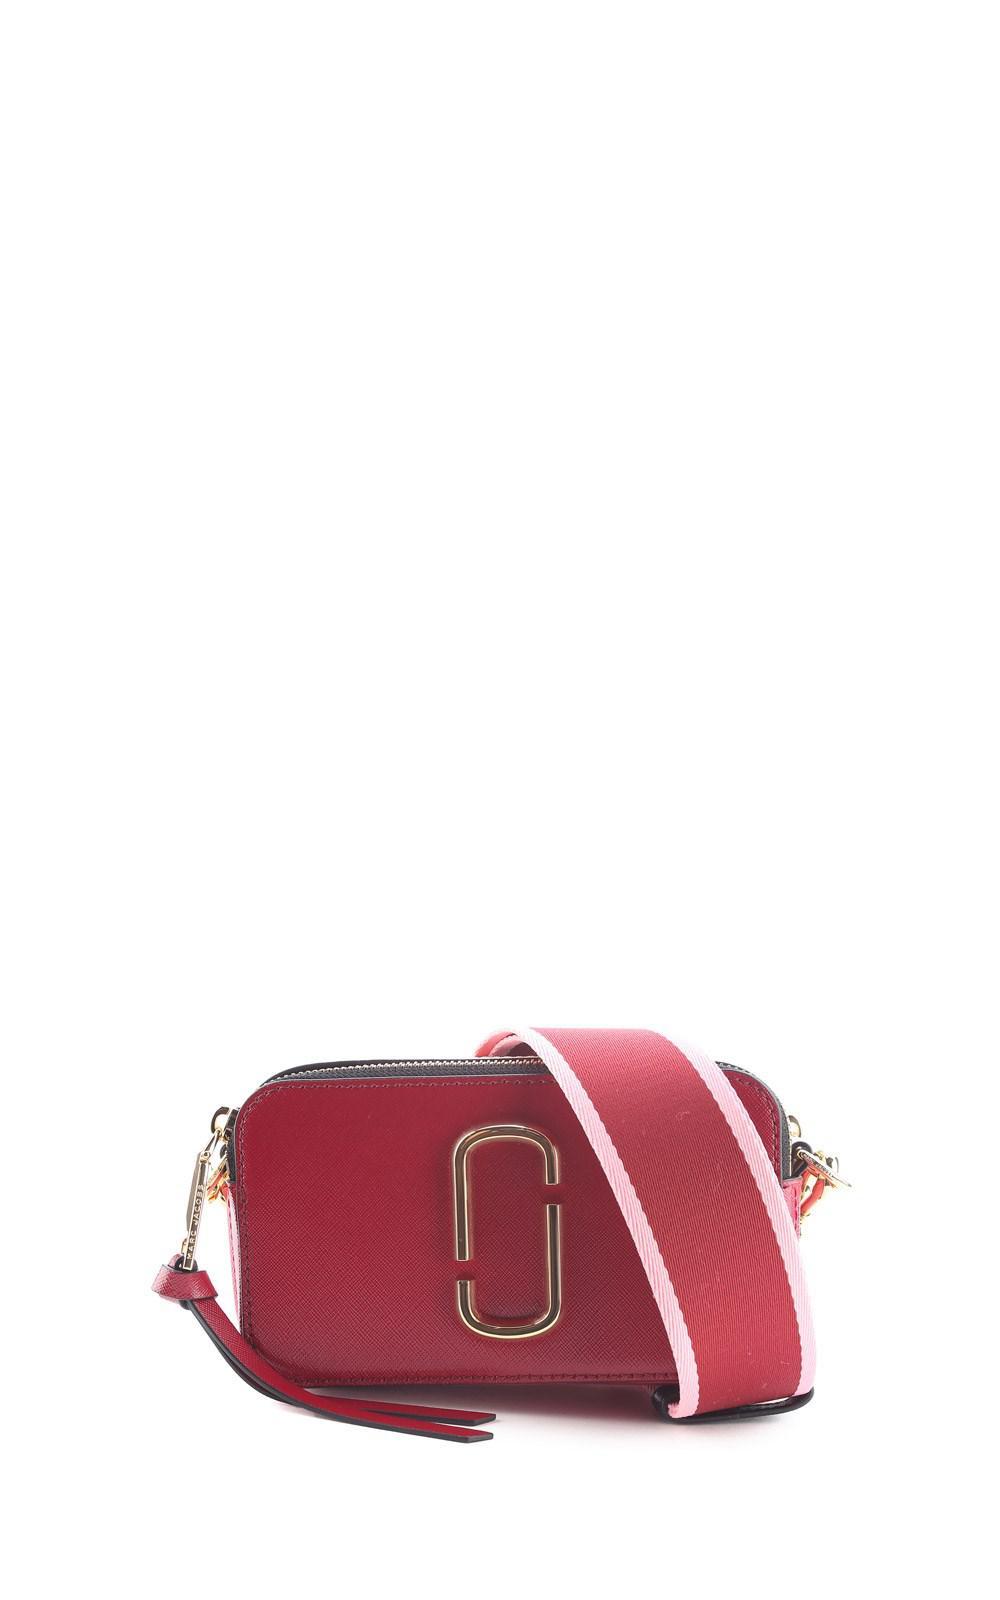 Marc Jacobs. Women s Snapshot Camera Bag Saffiano Leather Cross-body Bag 19cf5c60bbf2